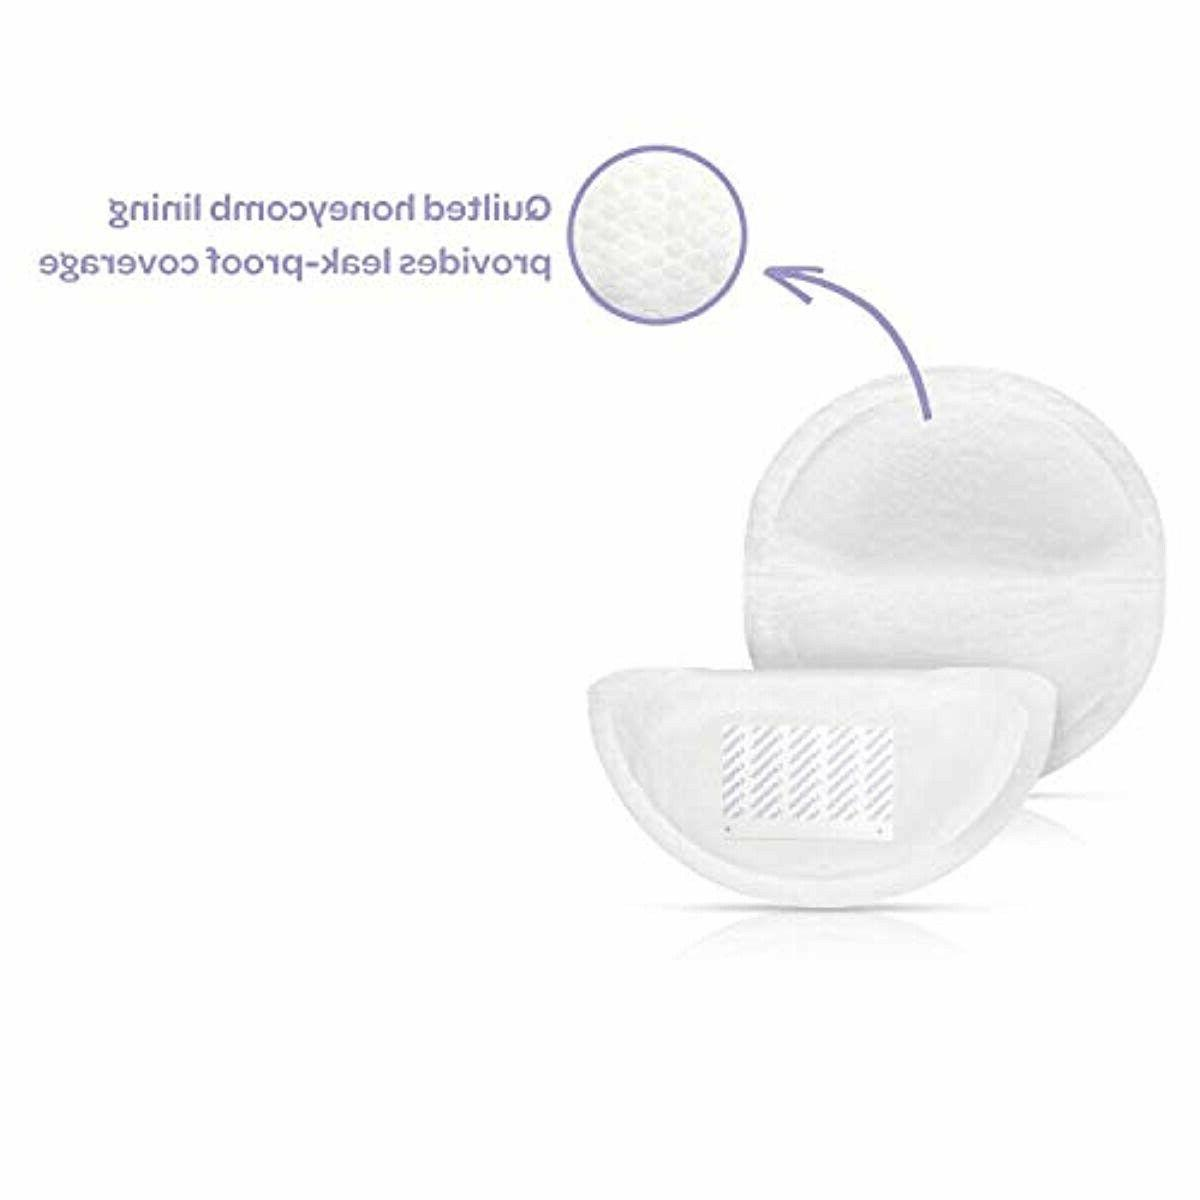 Lansinoh Packs of Dry Disposable Breast